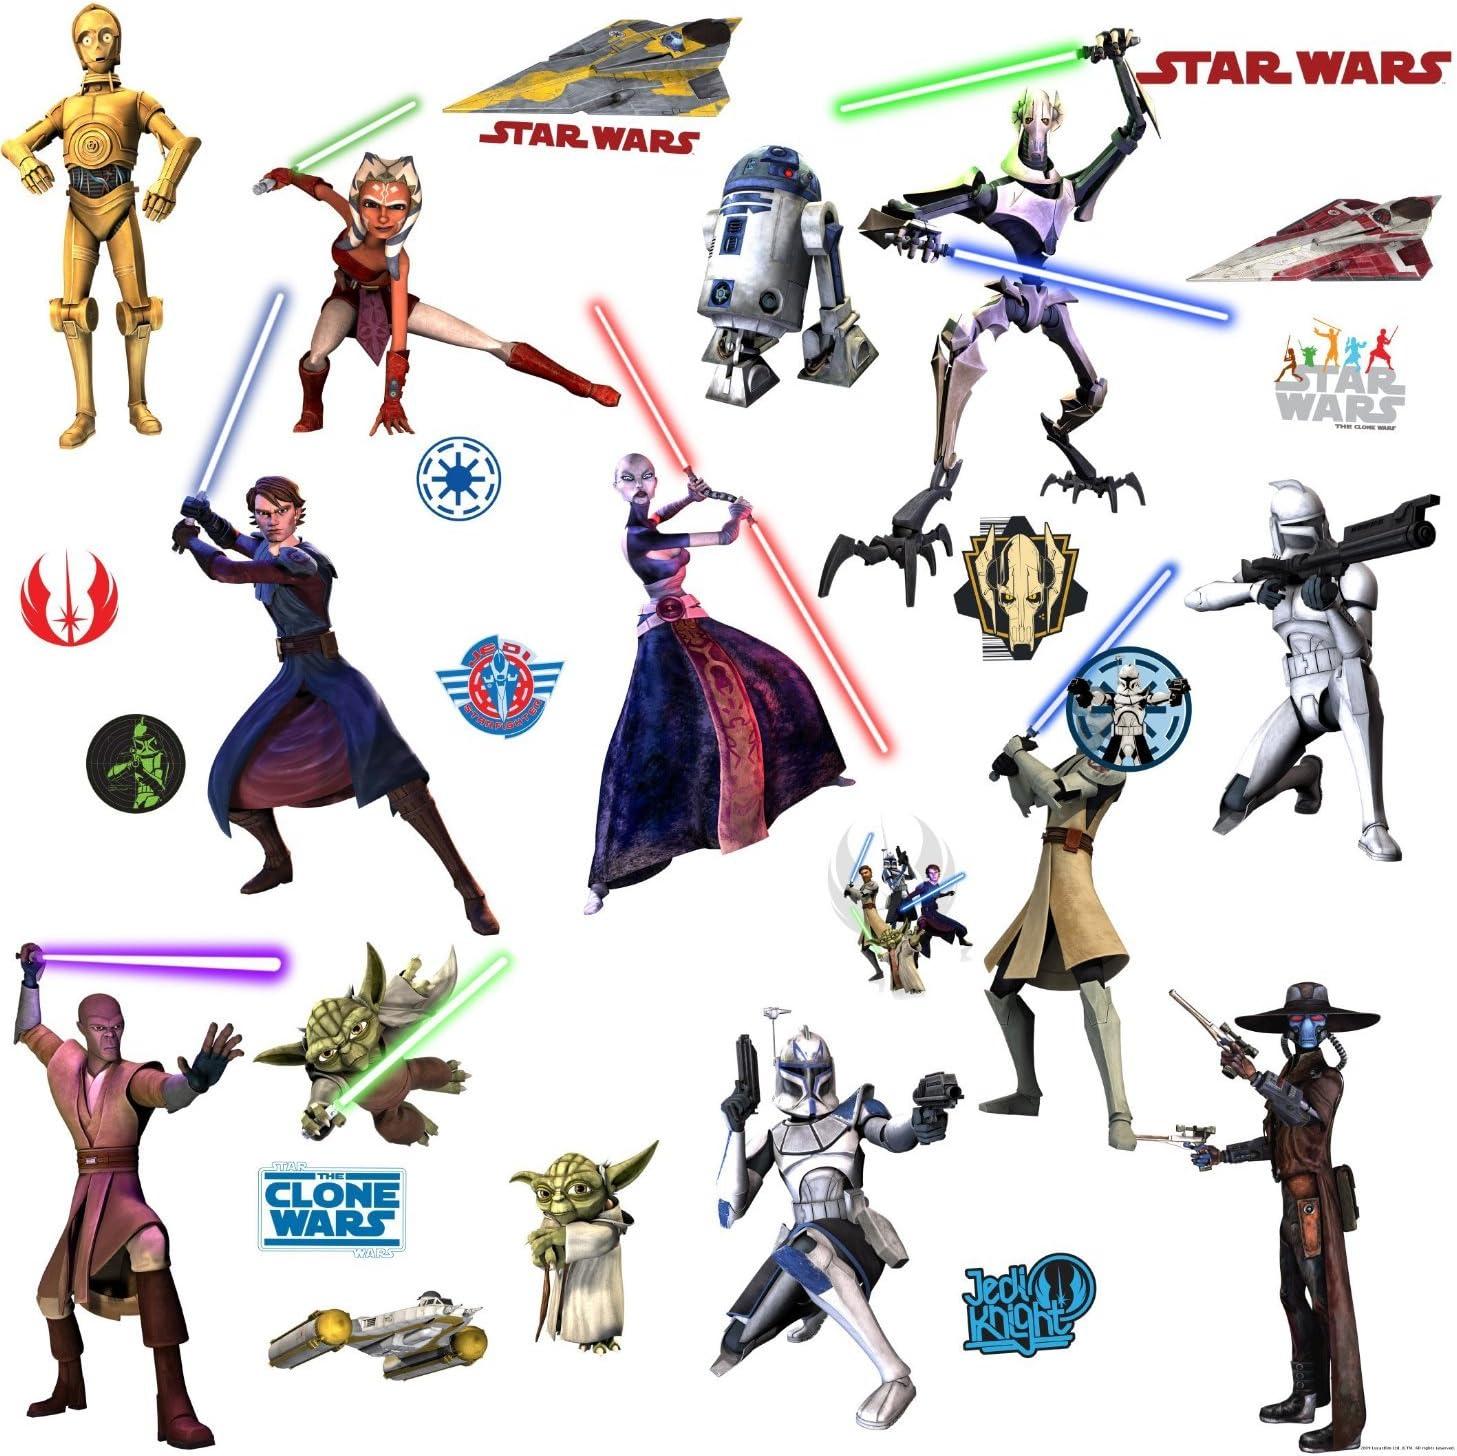 Star Wars Movie - The Clone Wars Wall Decals Stickers - C-3PO, Yoda, Obi-Wan, Mace Windu, Anakin Skywalker, Ahsoka Tano, R2D2, Clone Trooper Soldier, EP VII Storm Trooper, General Grievous